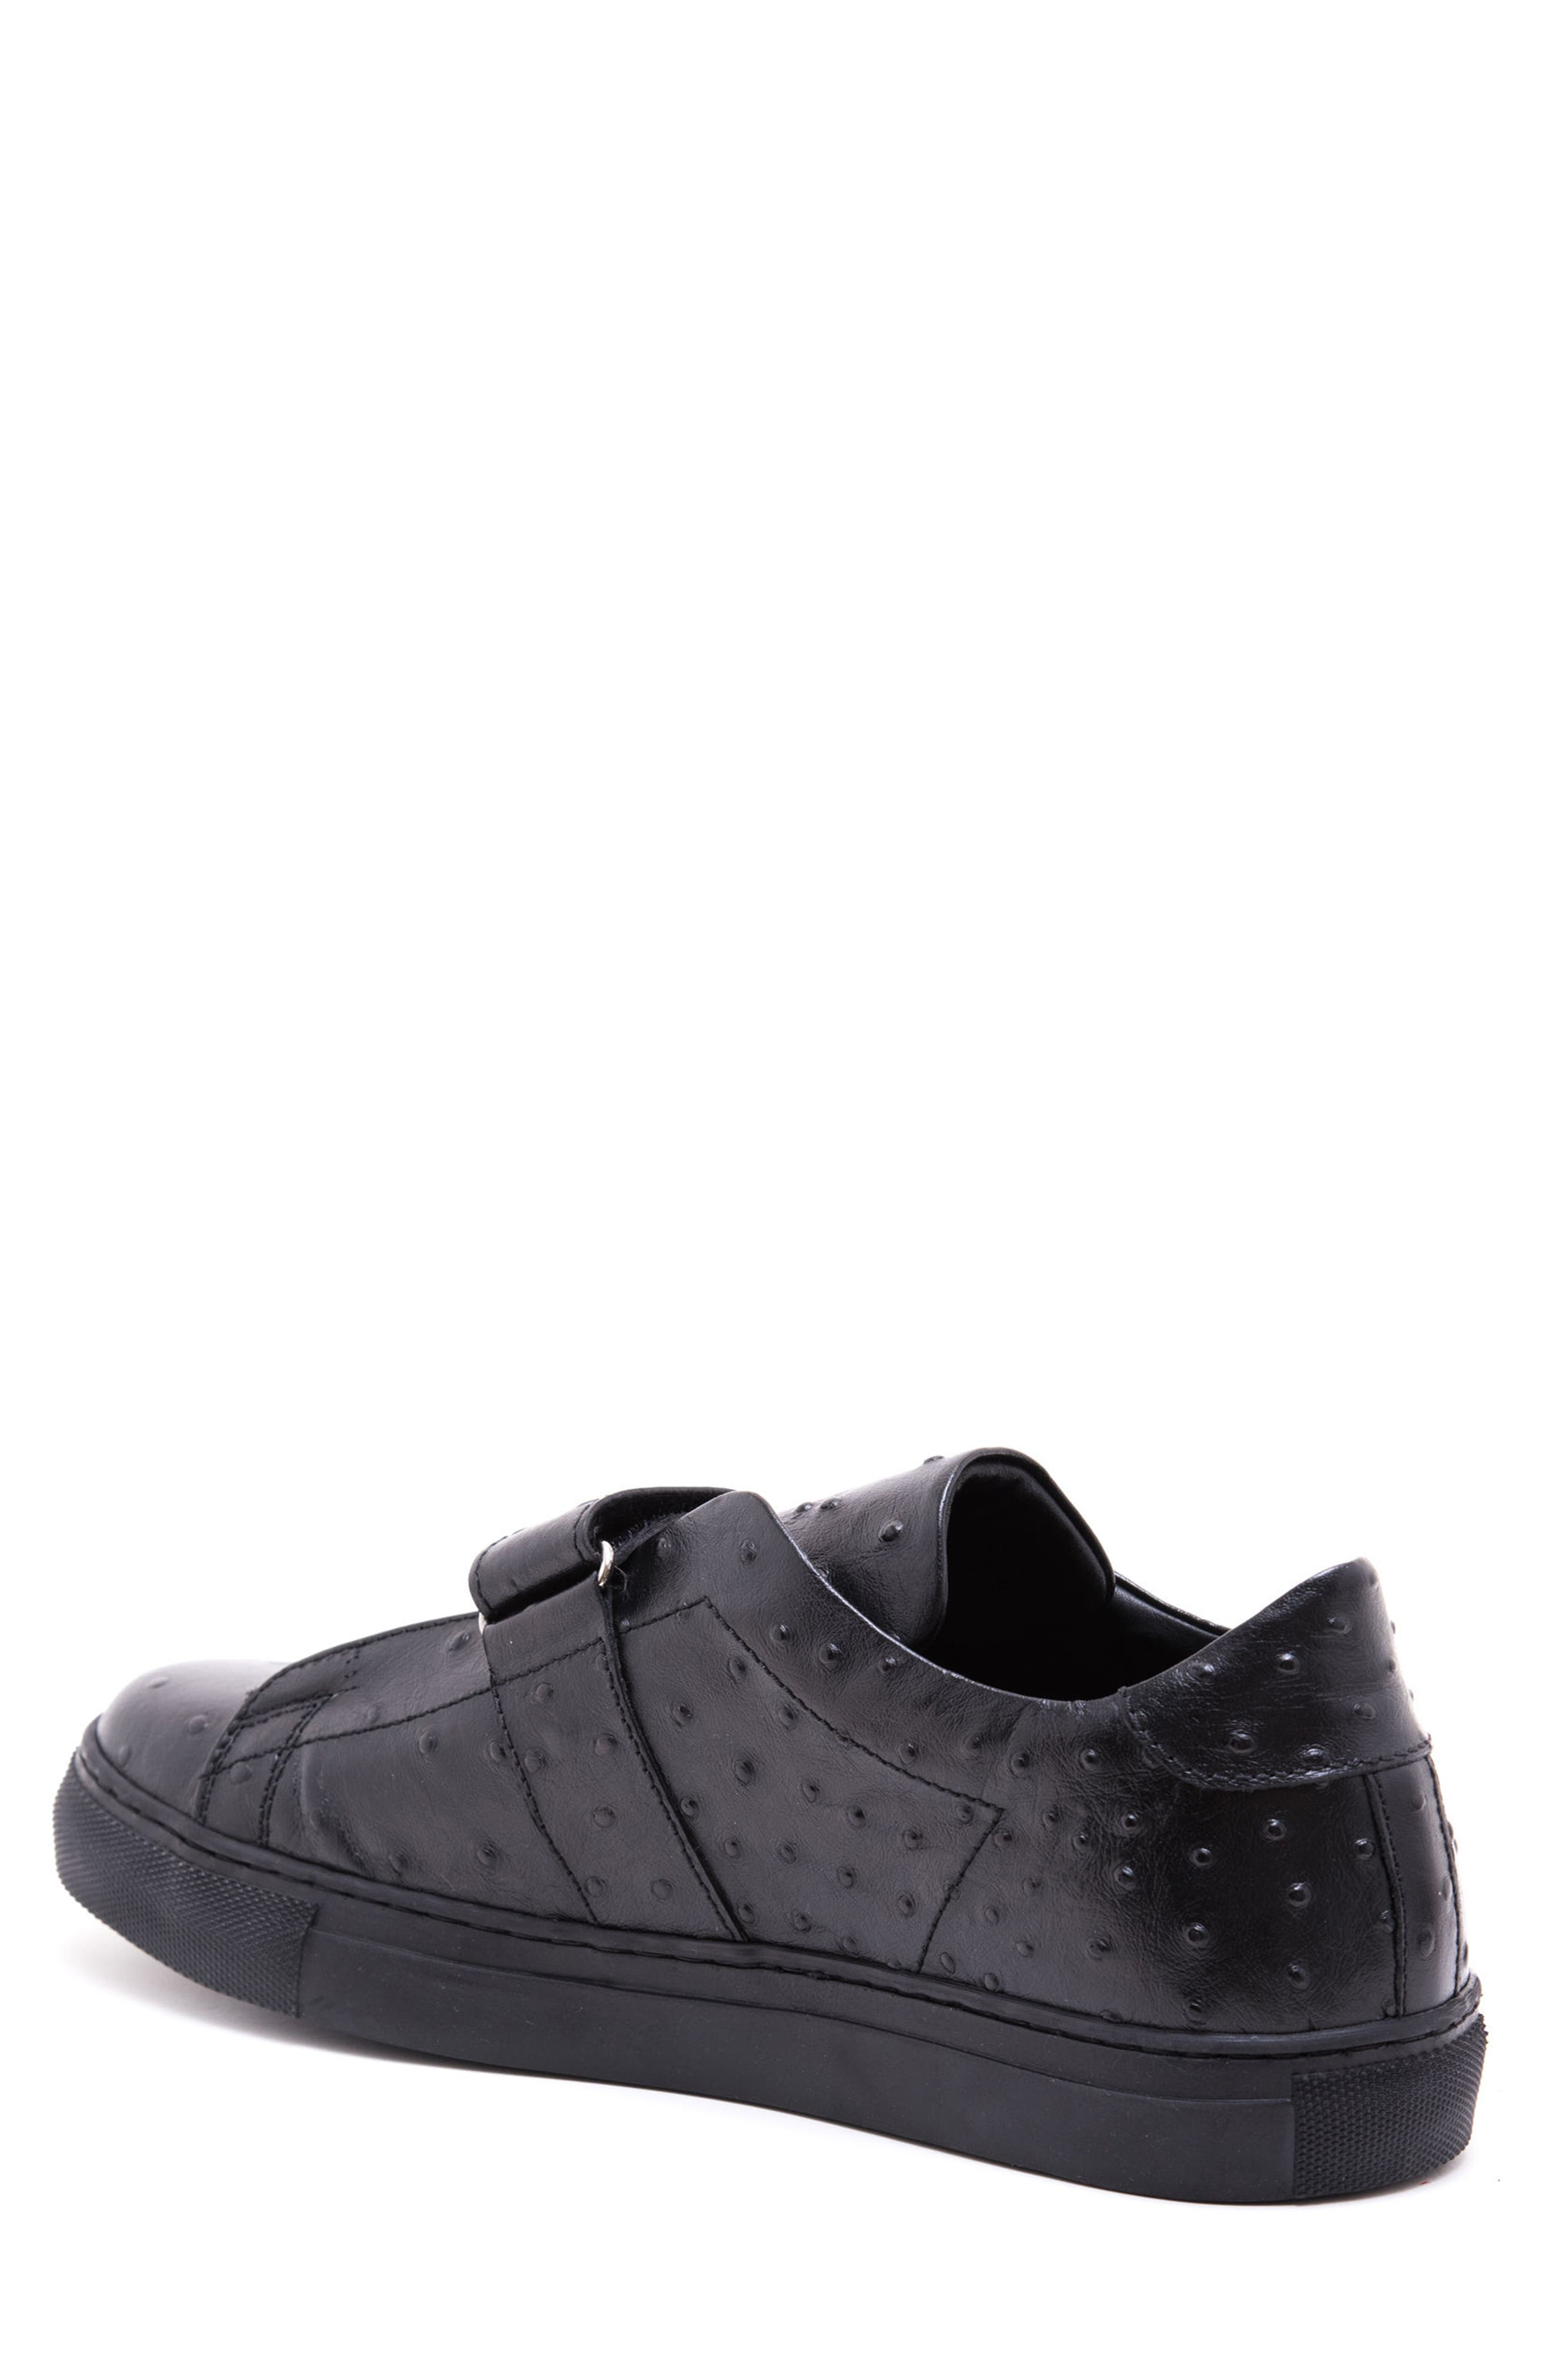 West Sneaker,                             Alternate thumbnail 2, color,                             BLACK